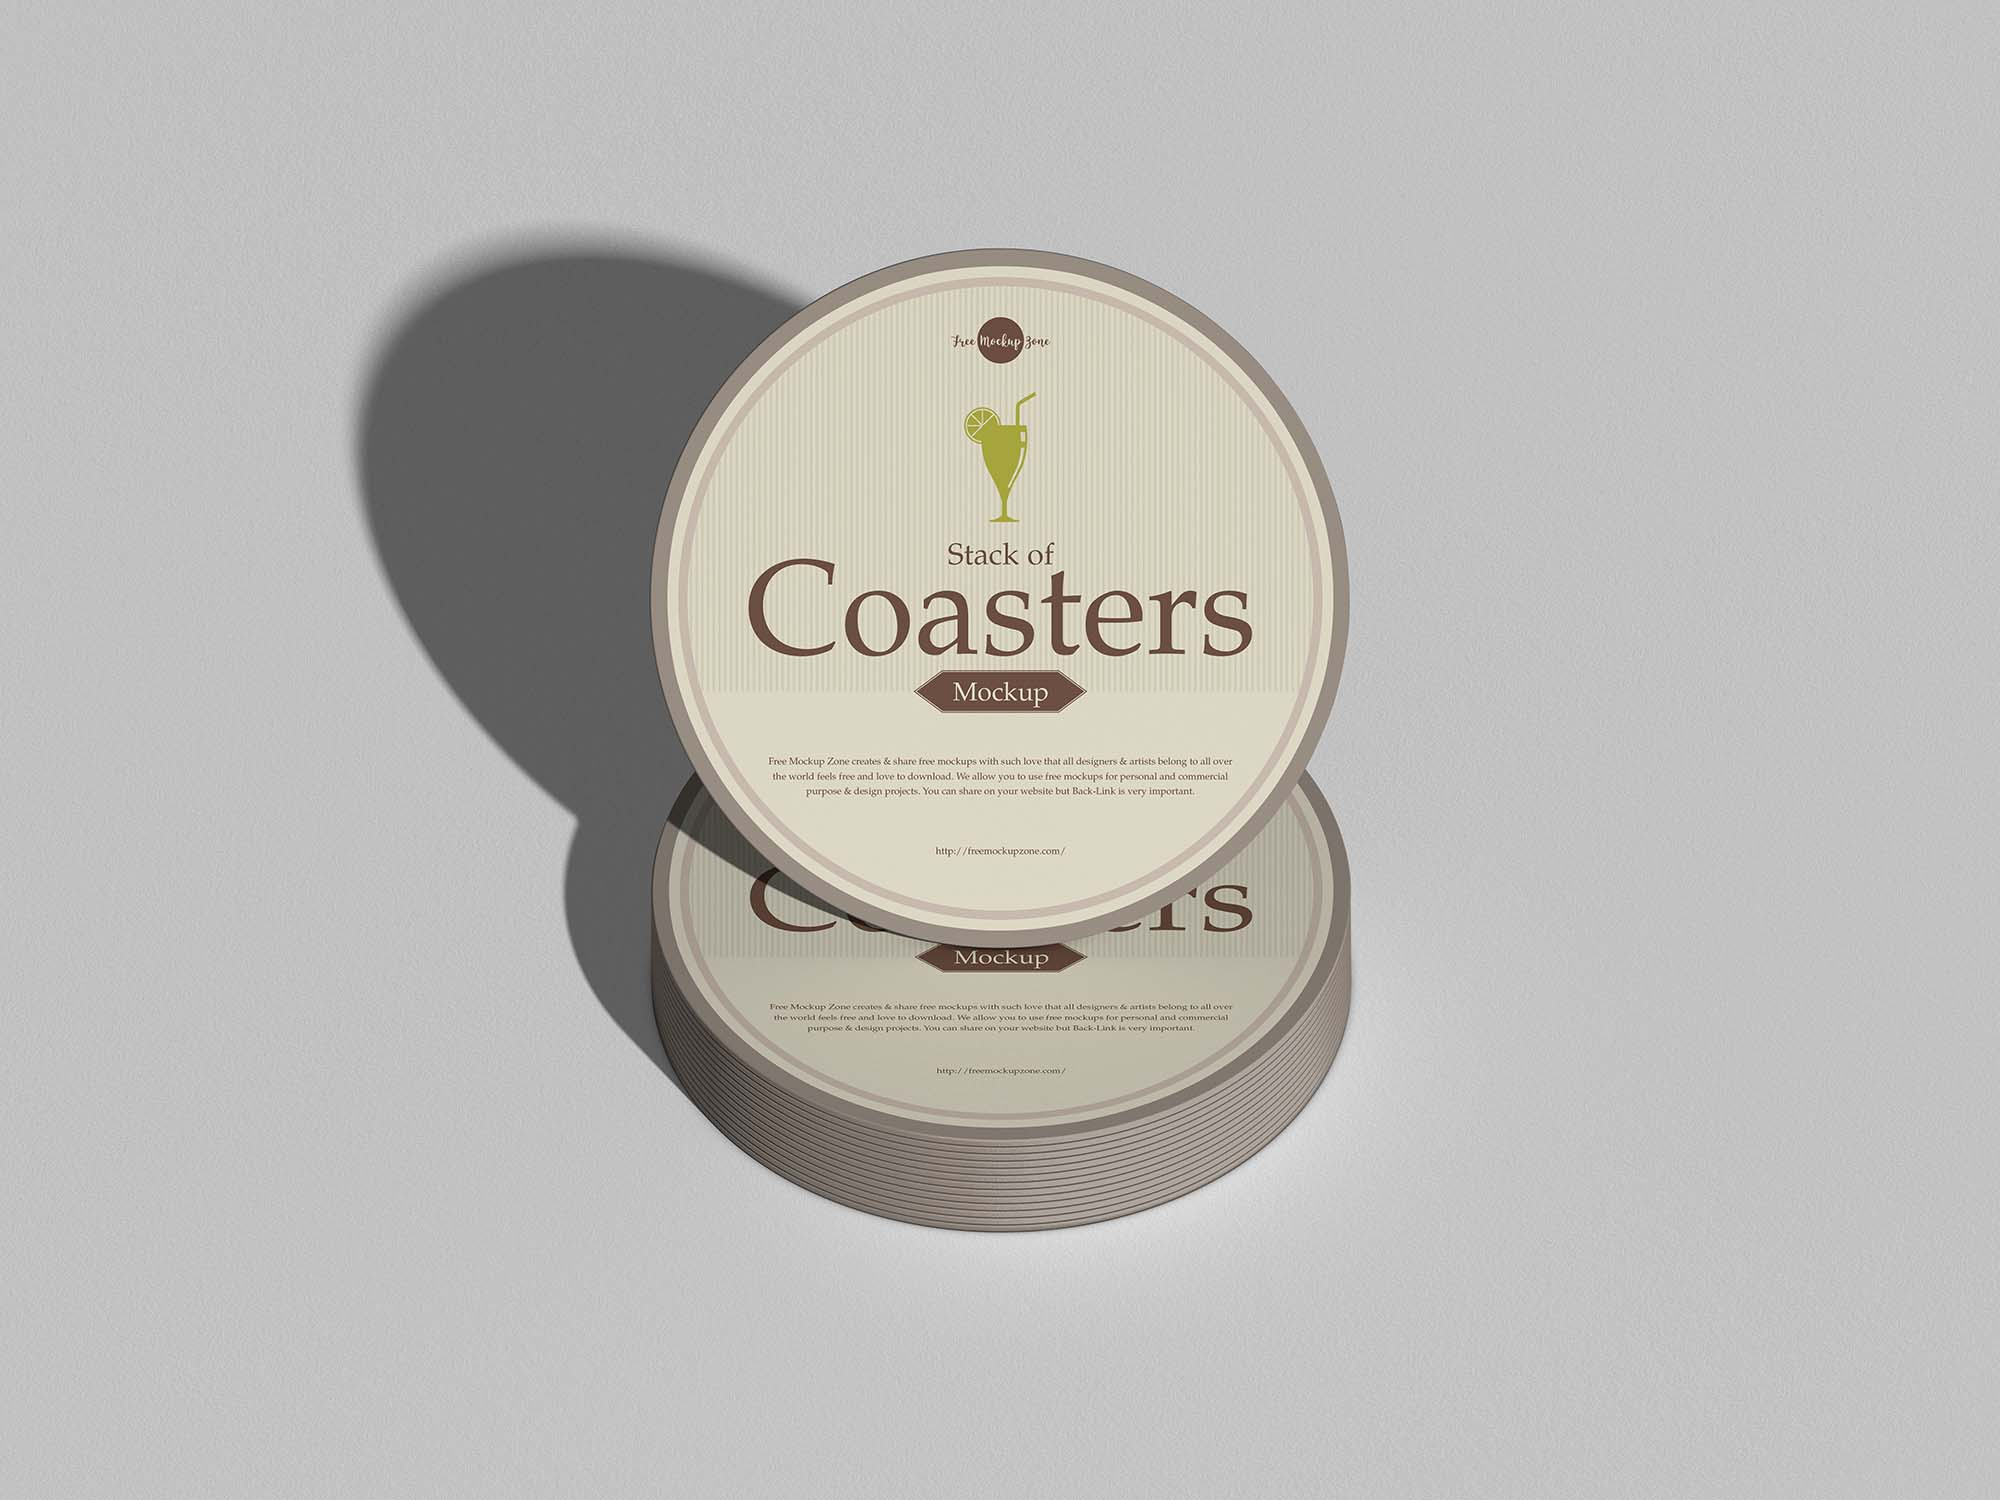 Round Coasters Mockup